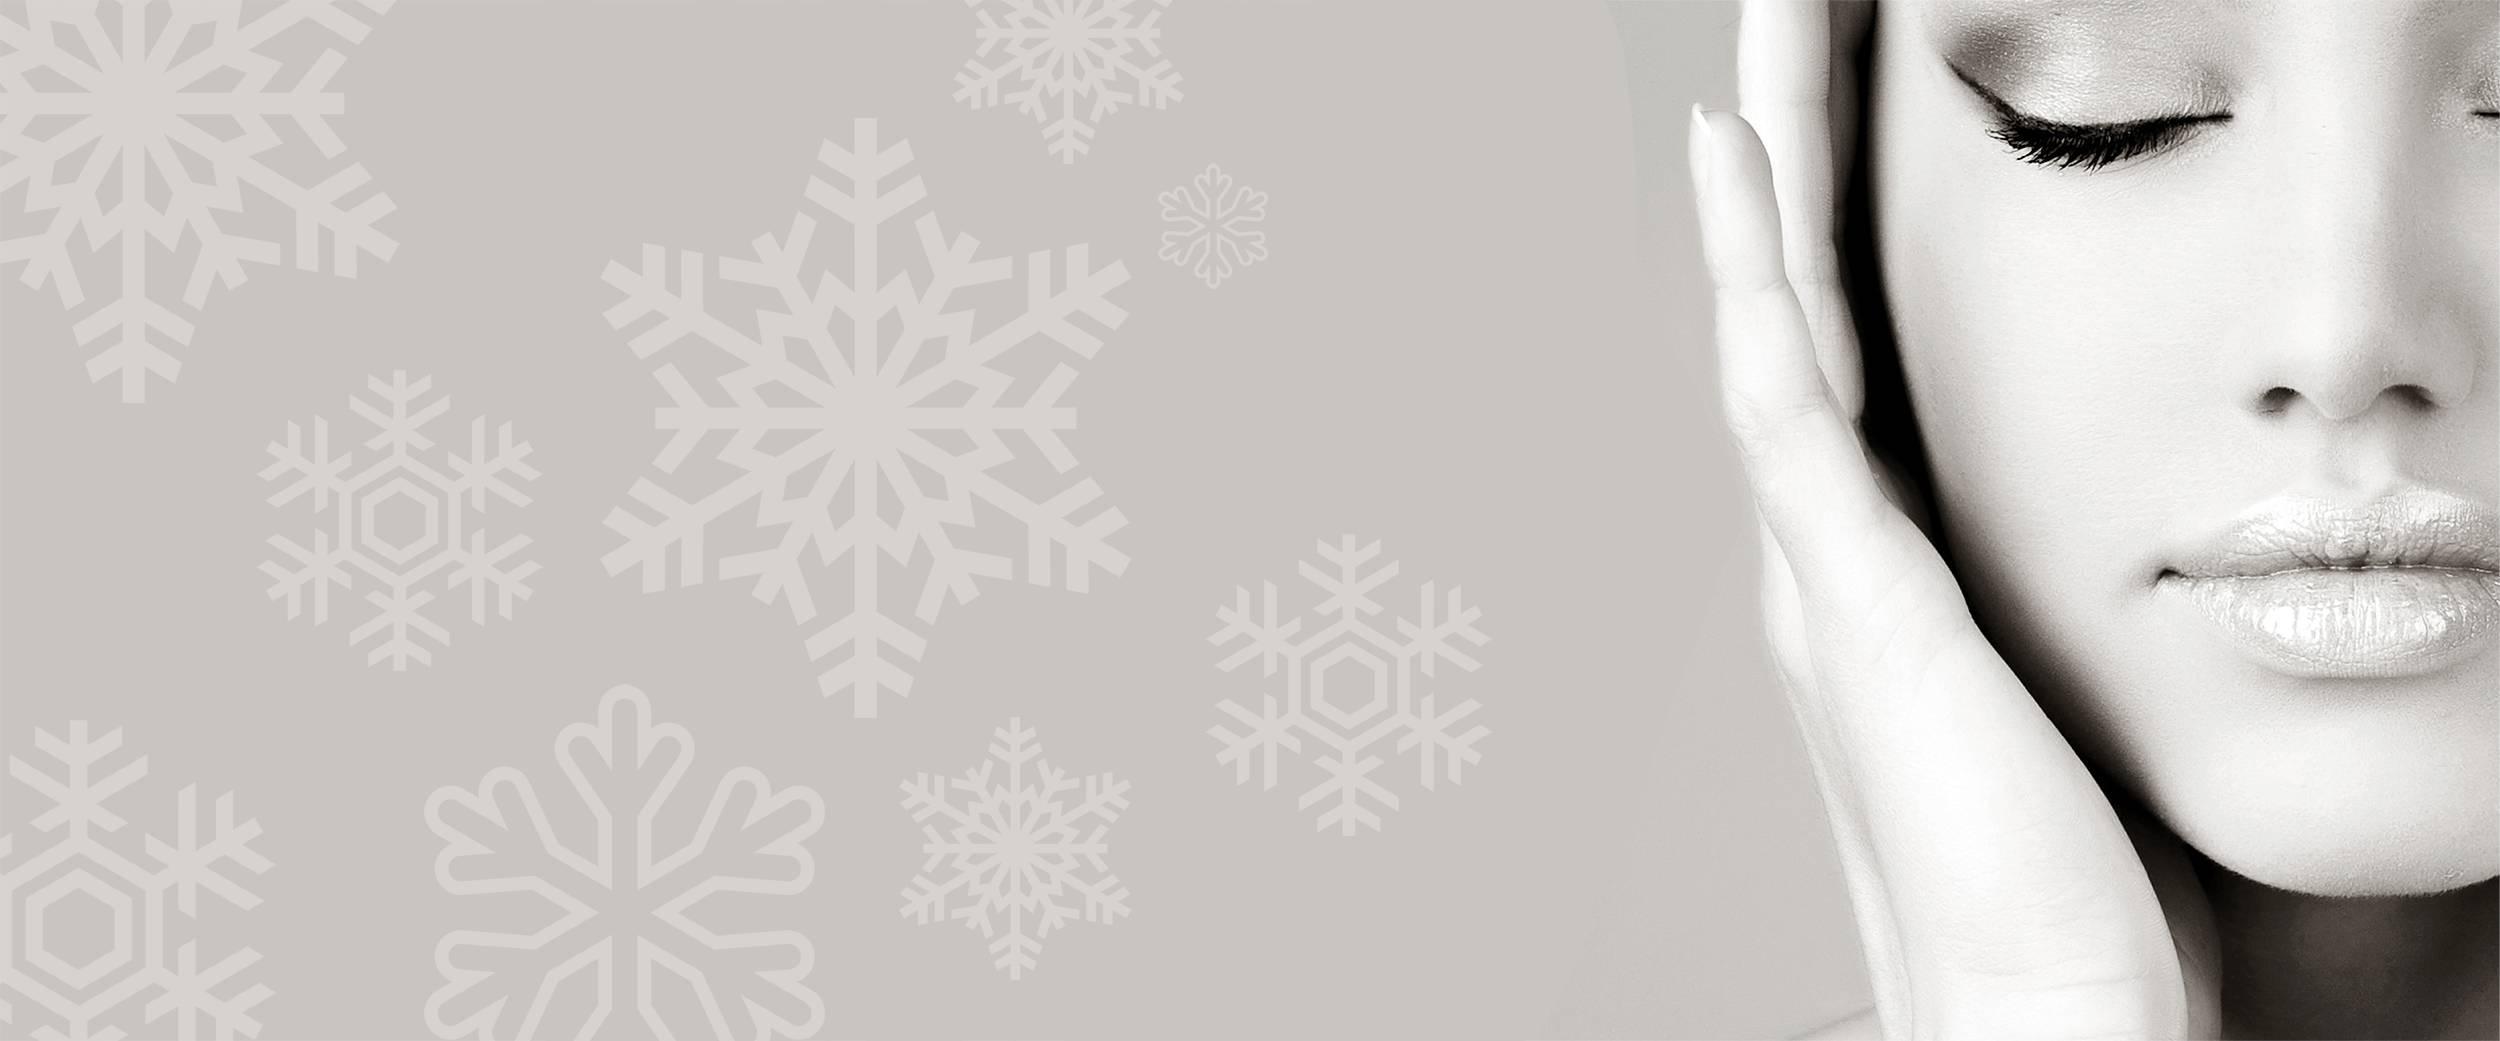 special-winterchillslider2